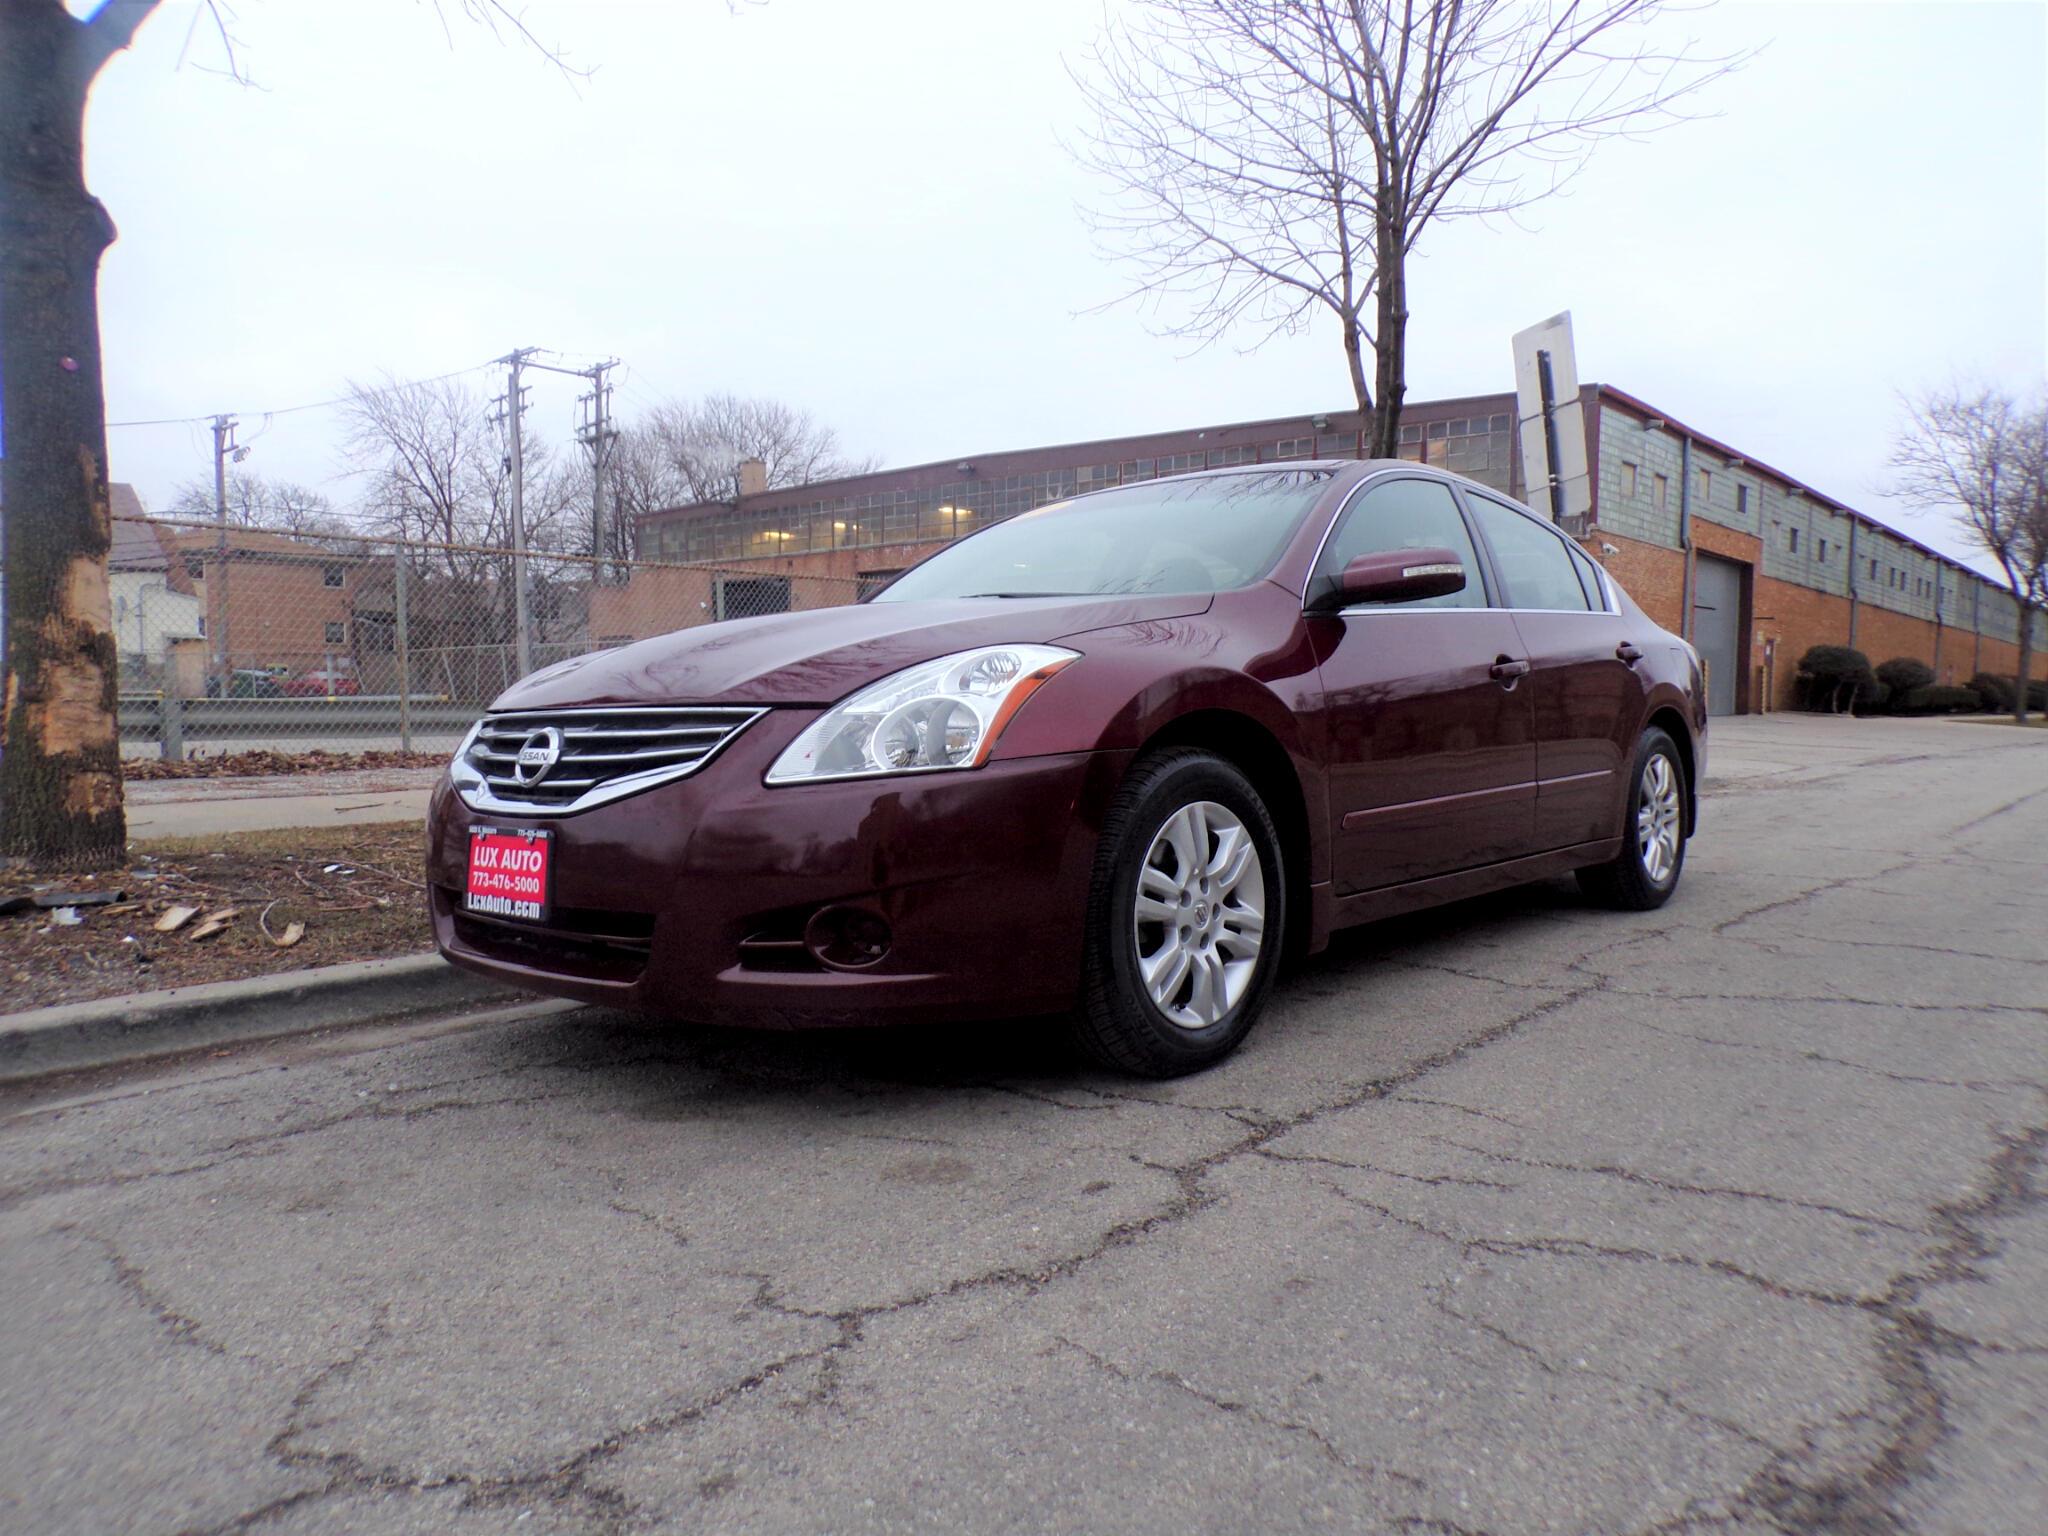 2010 Nissan Altima 4dr Sdn I4 CVT 2.5 SL